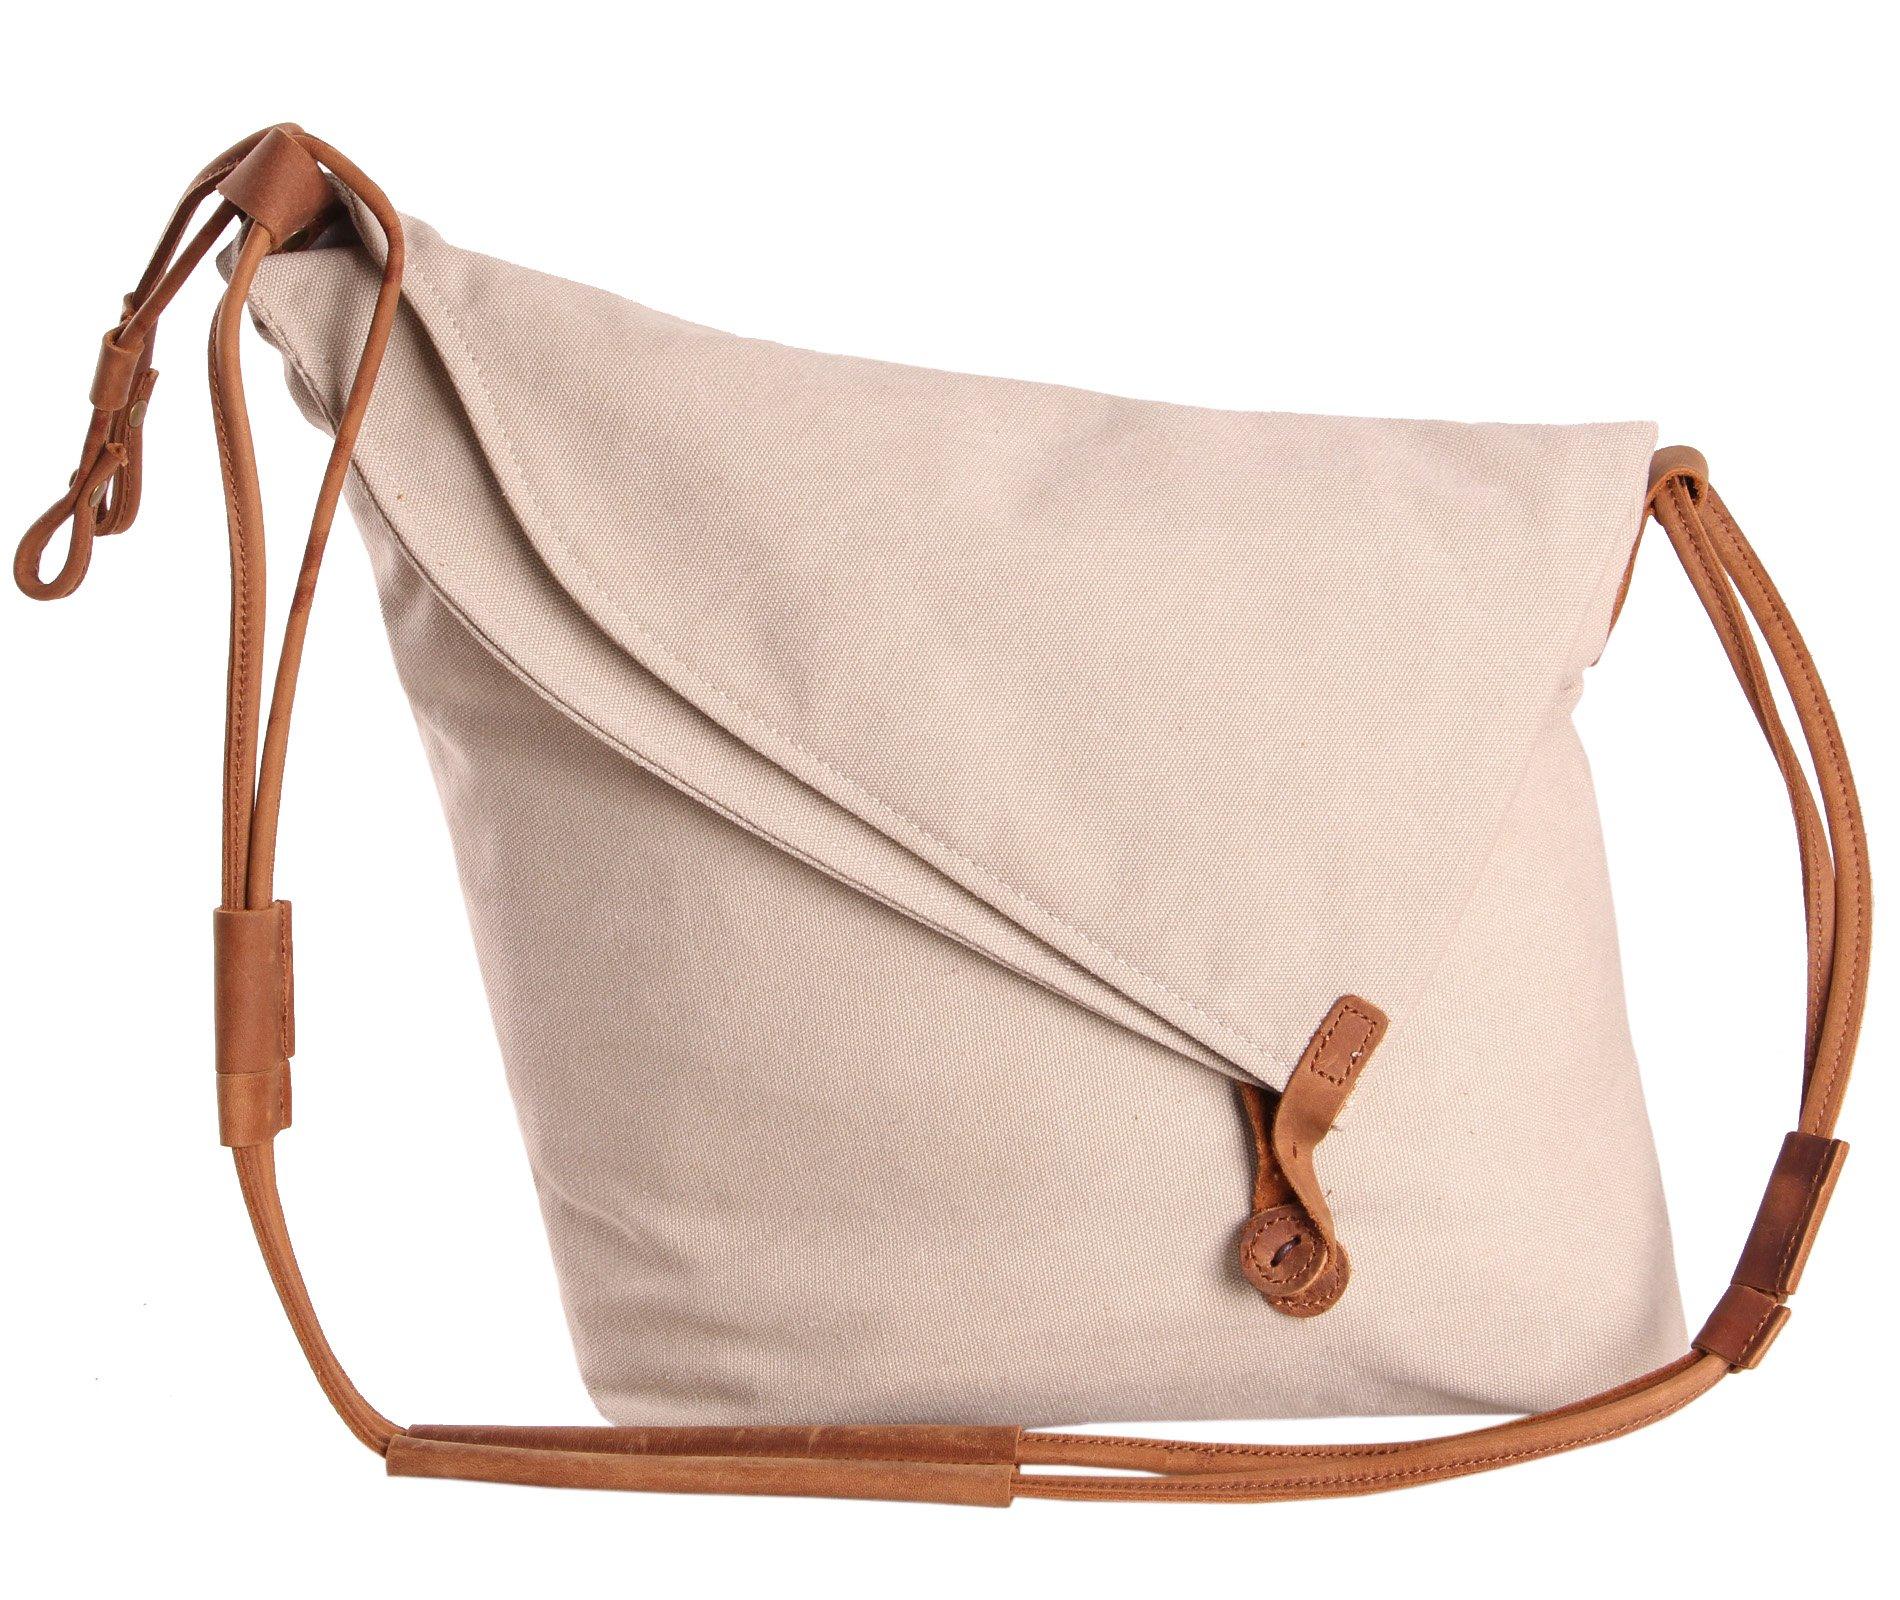 Tom Clovers Summer New Women's Men's Classy Look cool Simple style Casual Canvas Crossbody Messenger Shouder Handbag Tote Weekender Fashion Bag Beige